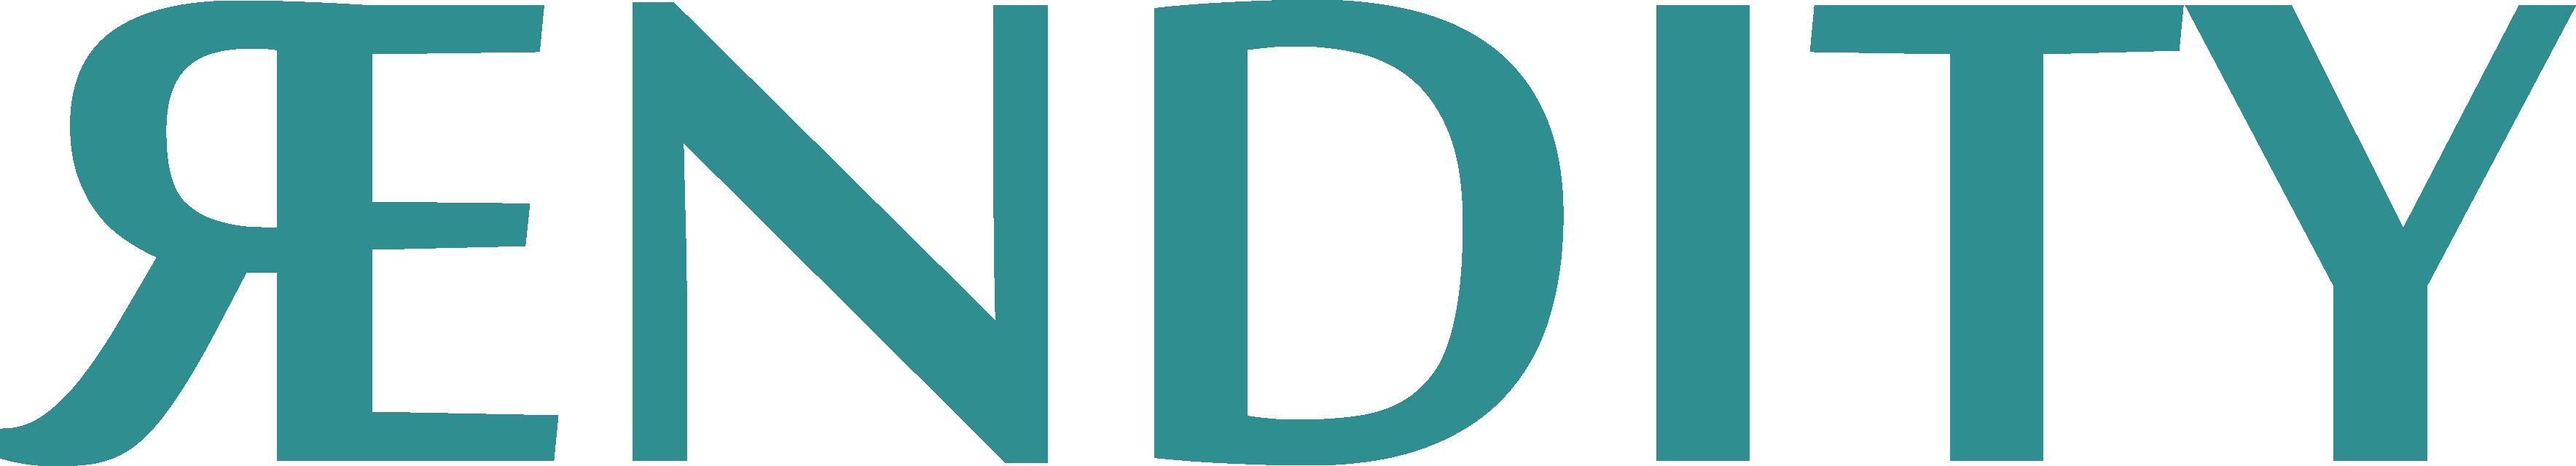 Rendity logo green